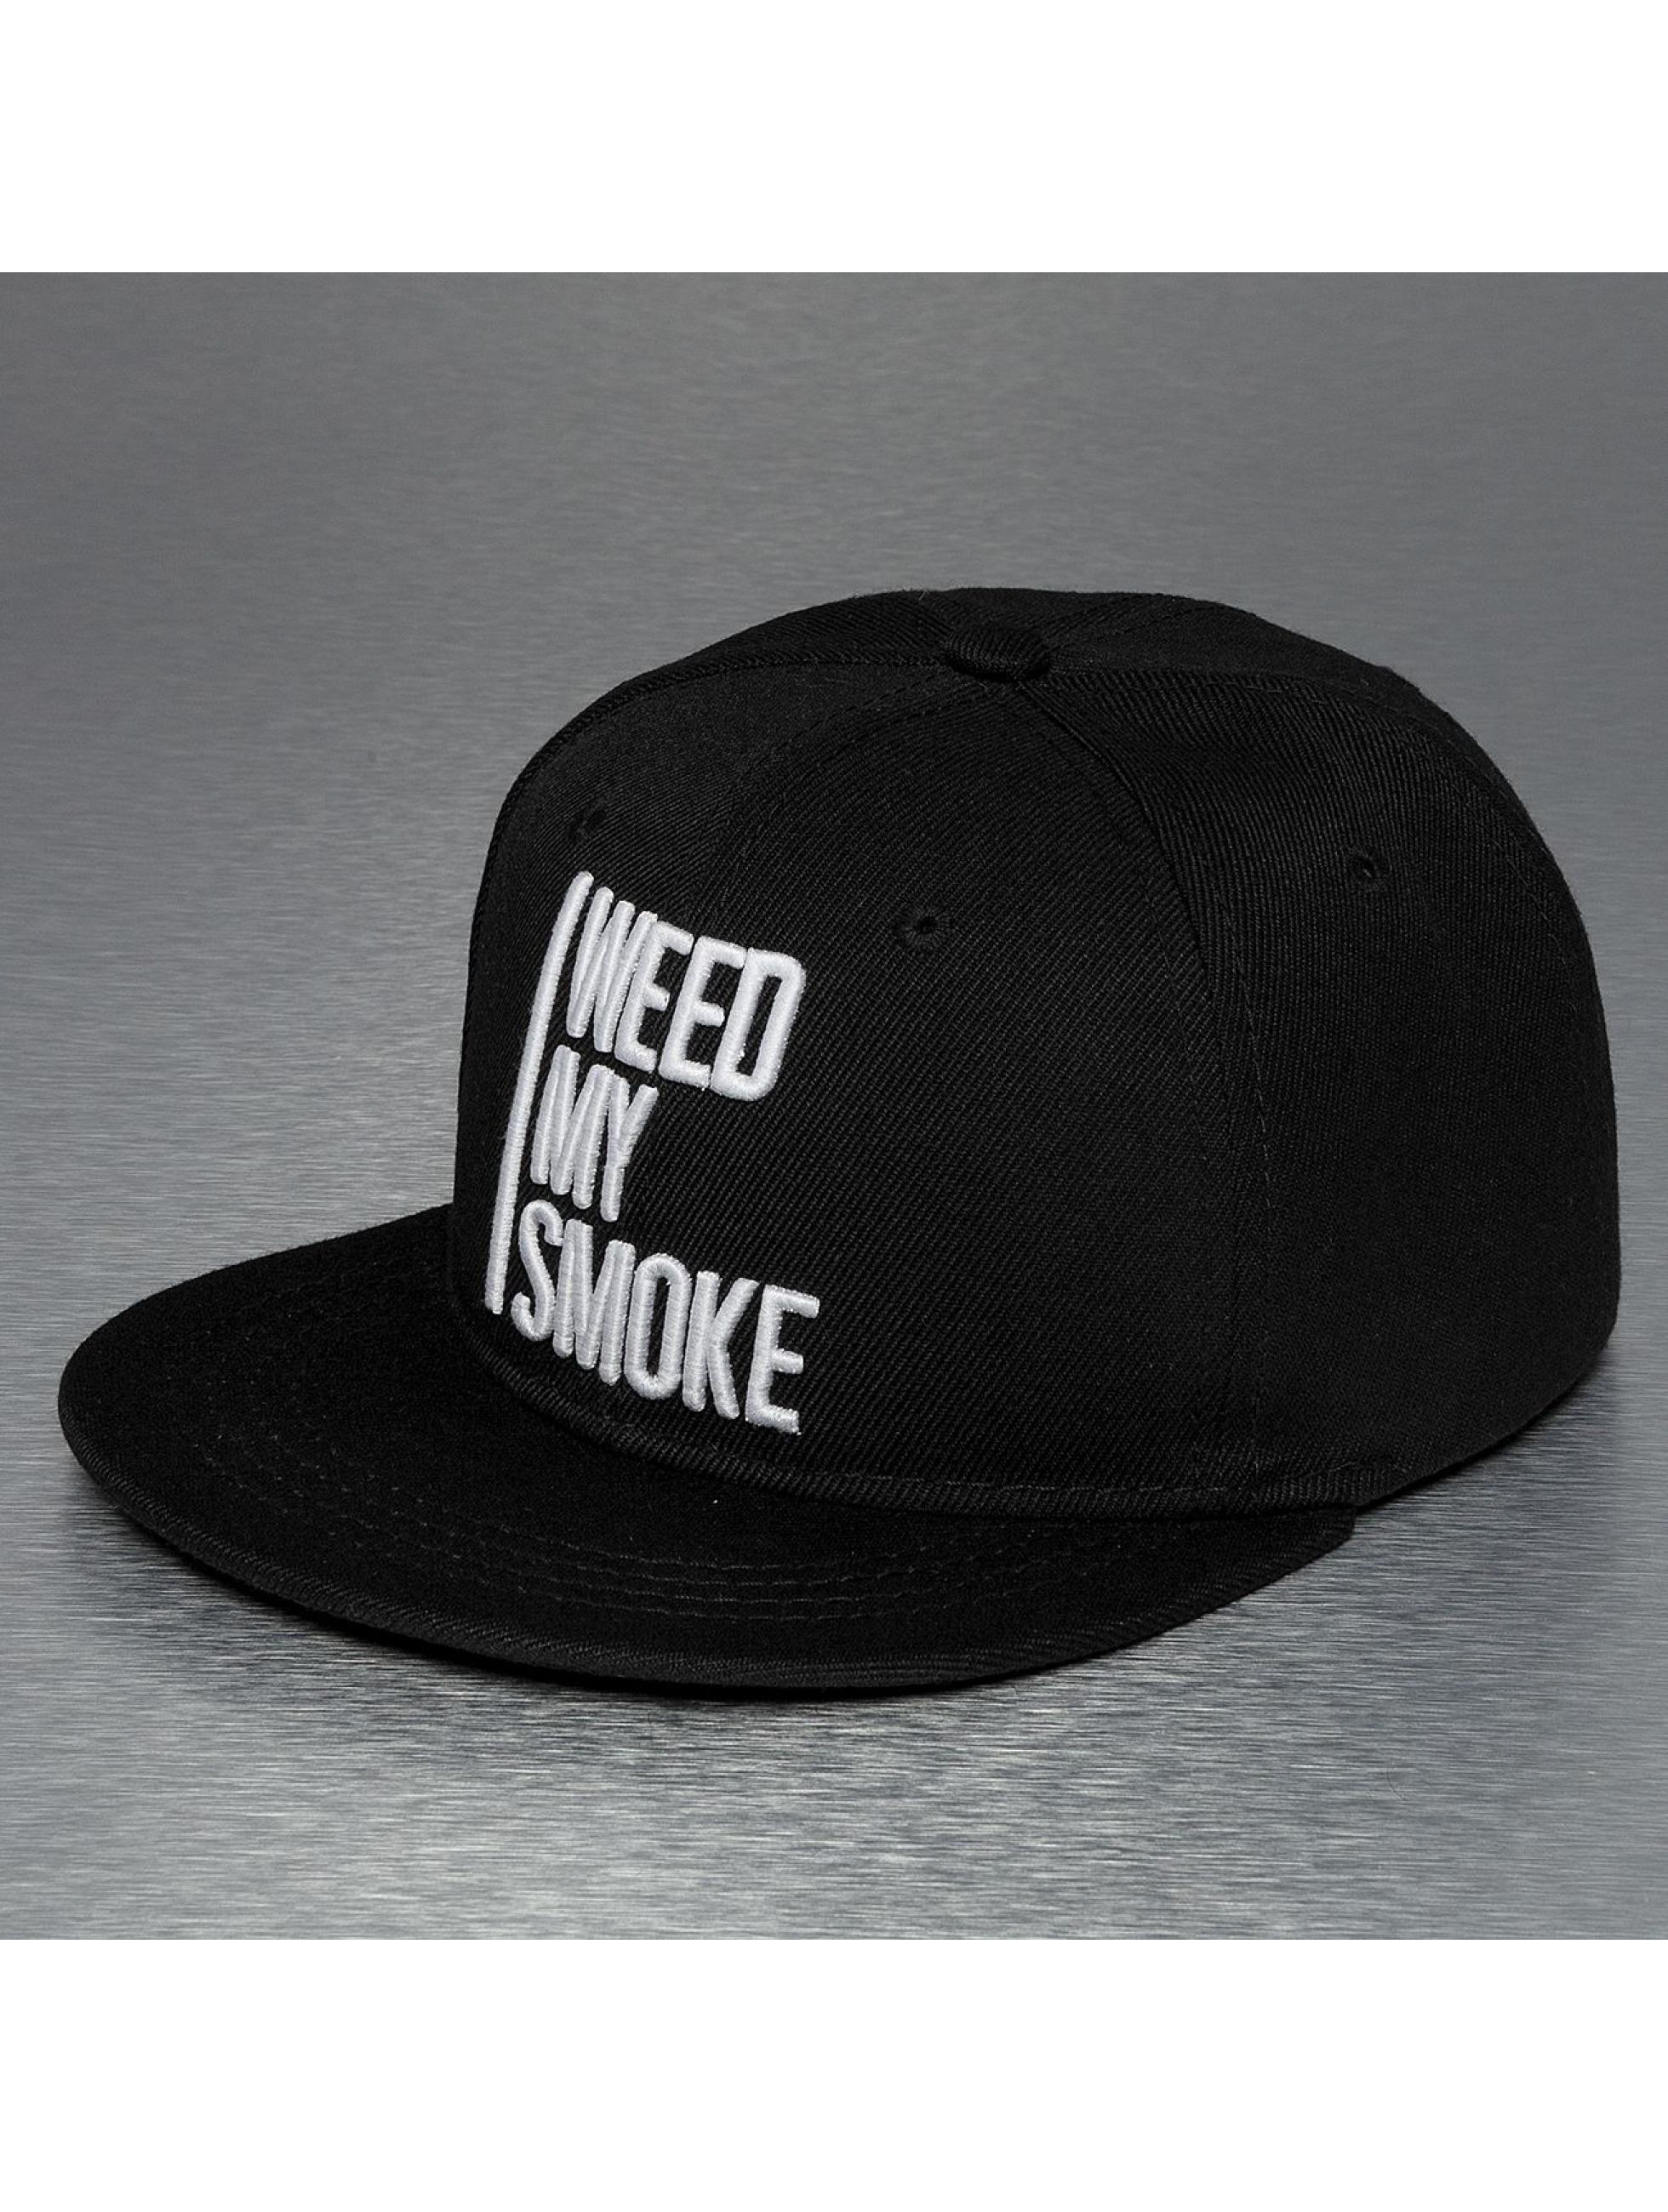 a60fb1e8b86 TrueSpin Snapback Cap Weed My Smoke in schwarz 119481